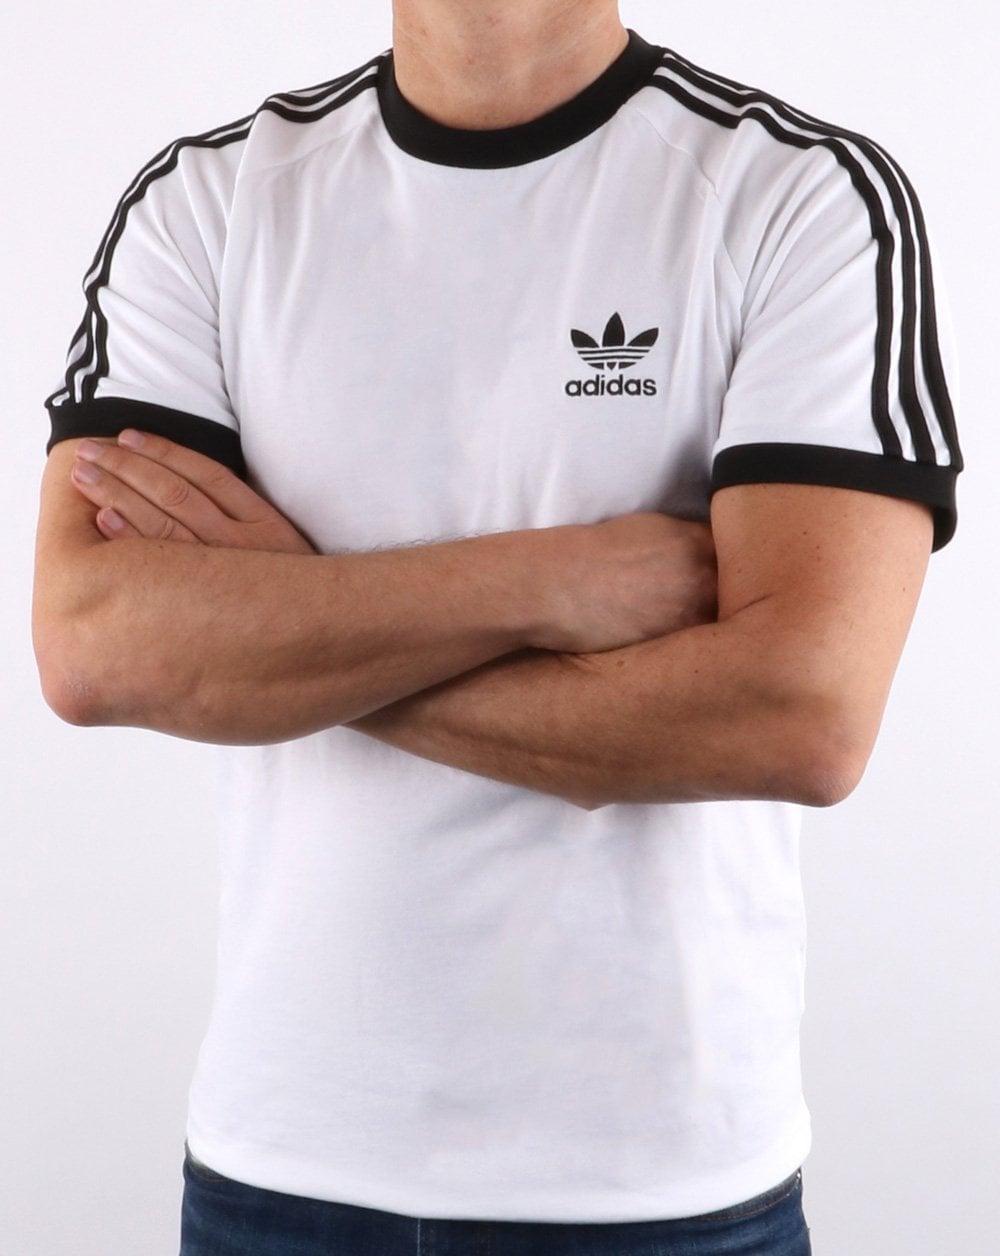 ab535cbb Adidas Originals Retro 3 Stripes T-shirt White,california,trefoil,tee